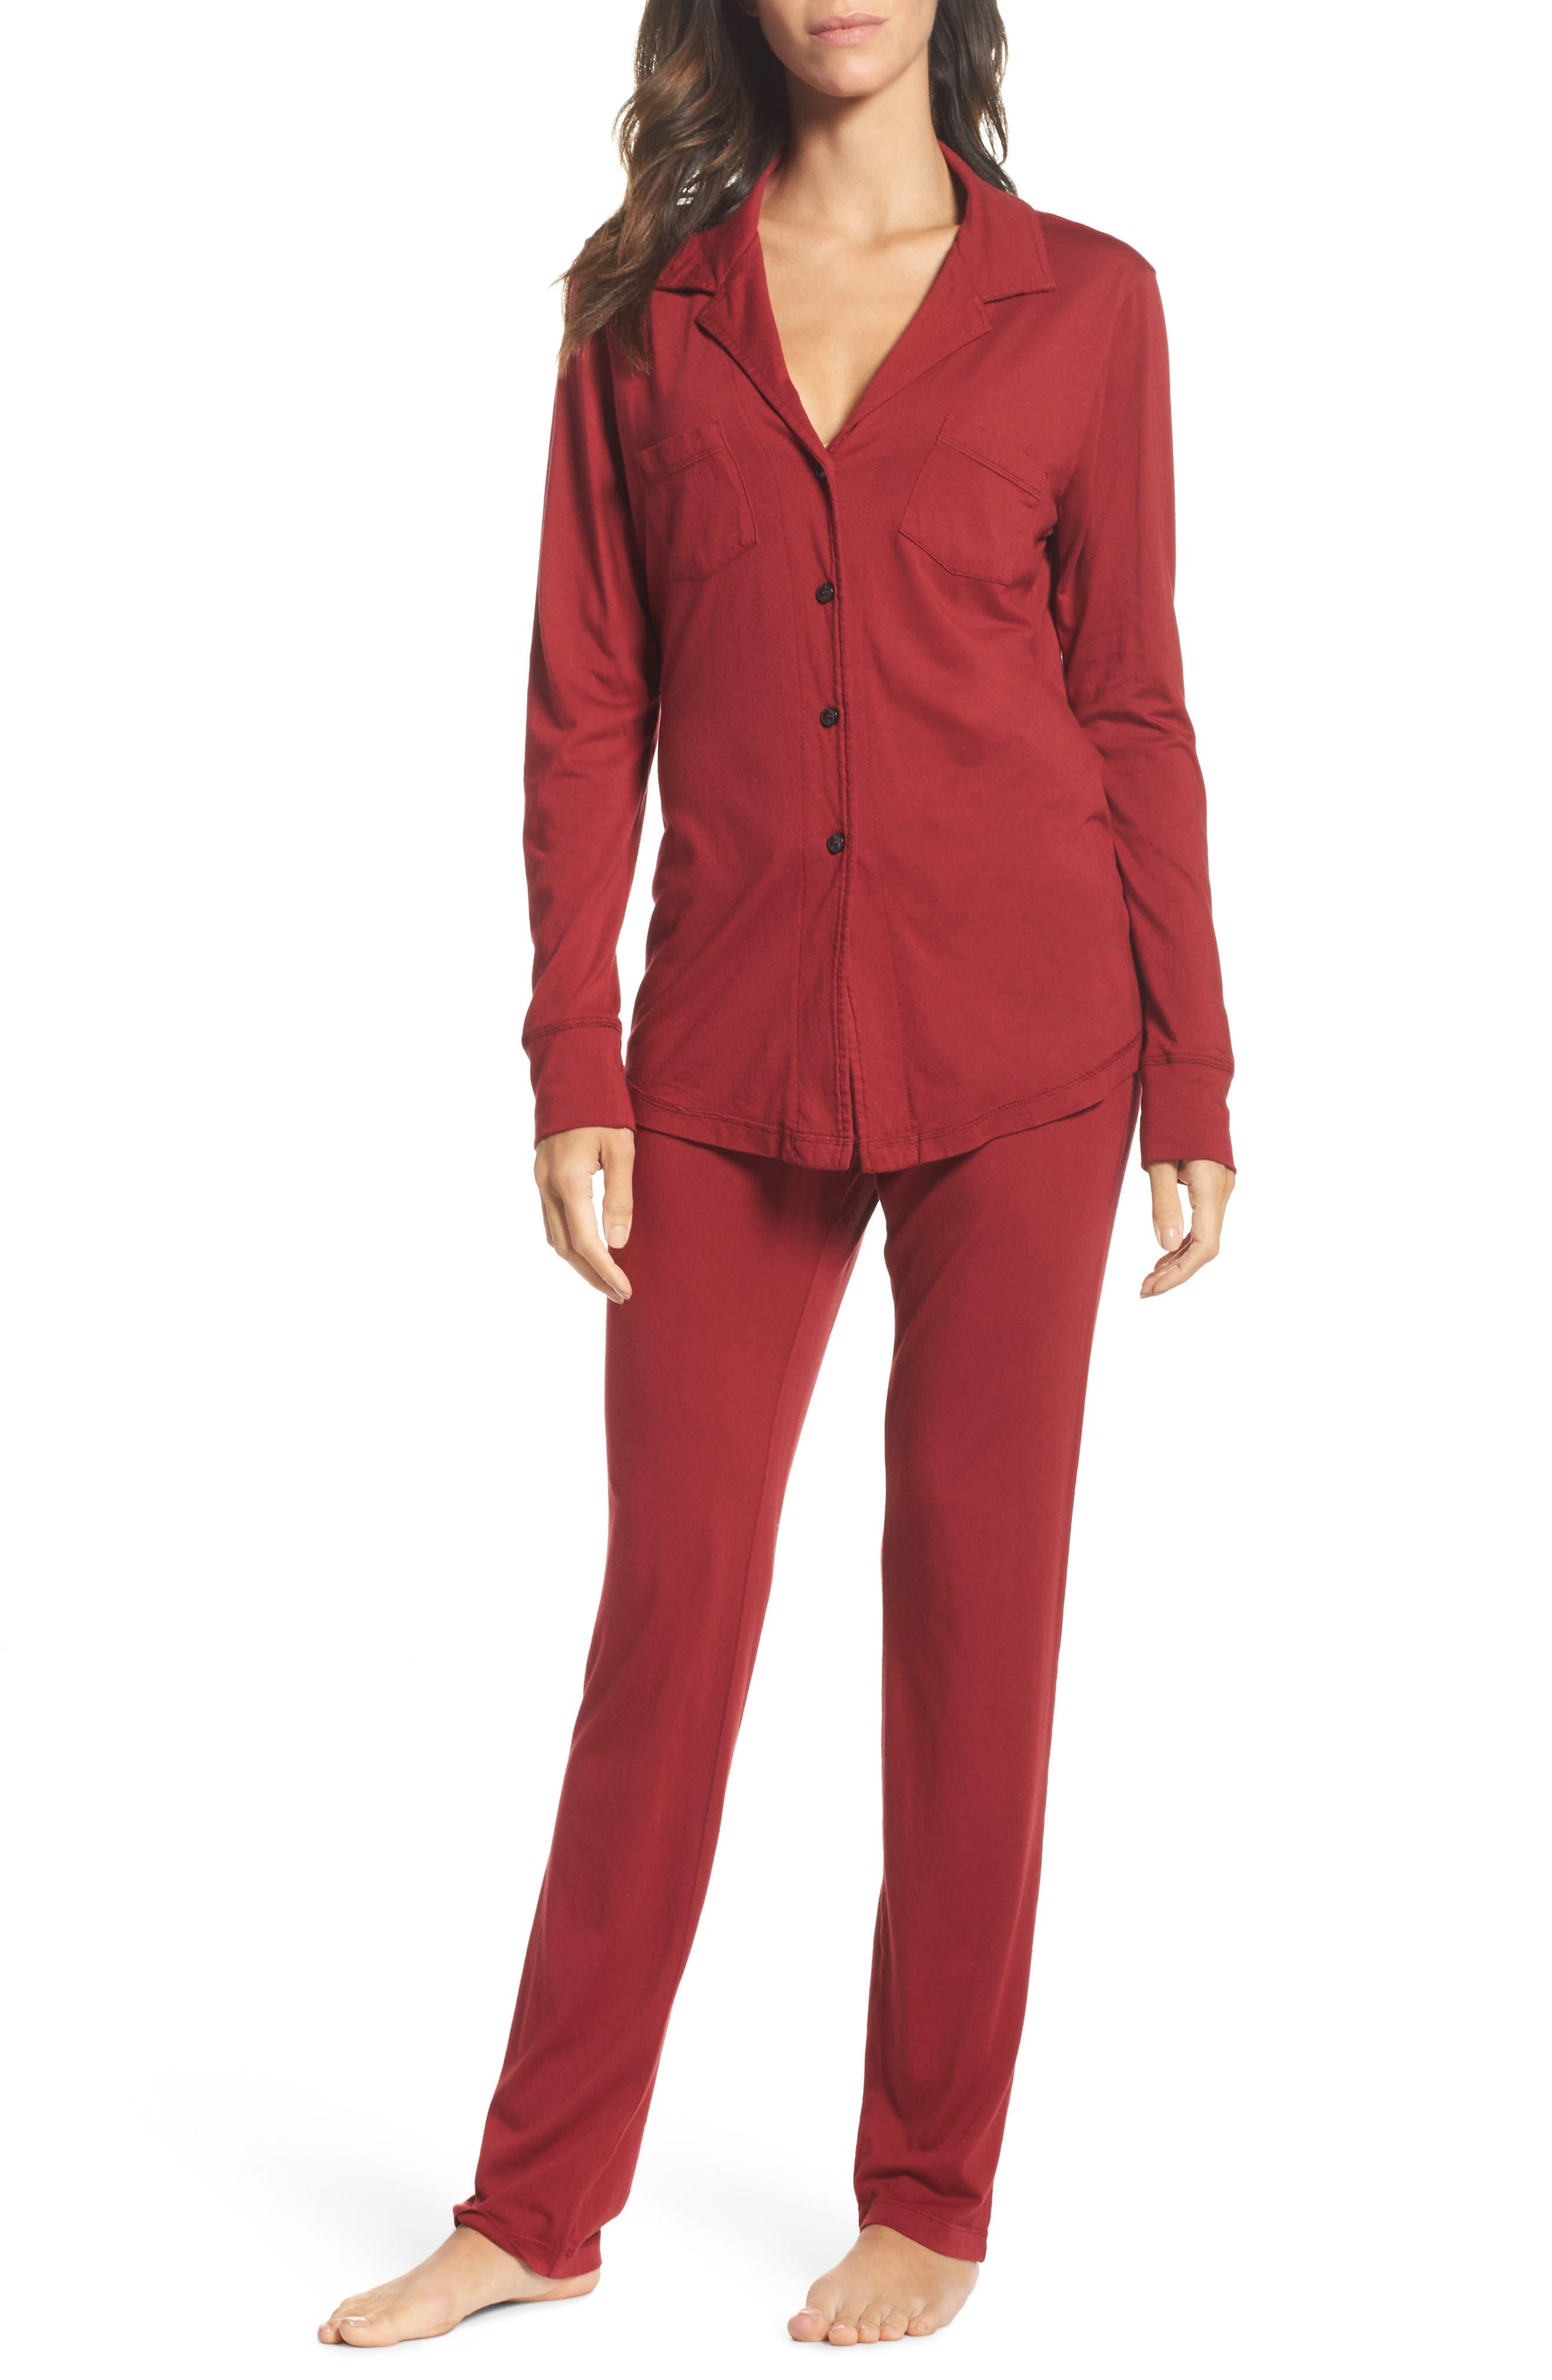 Alternate Image 1 Selected - LOVE+GRACE 'Cassie' Cotton & Modal Pajamas